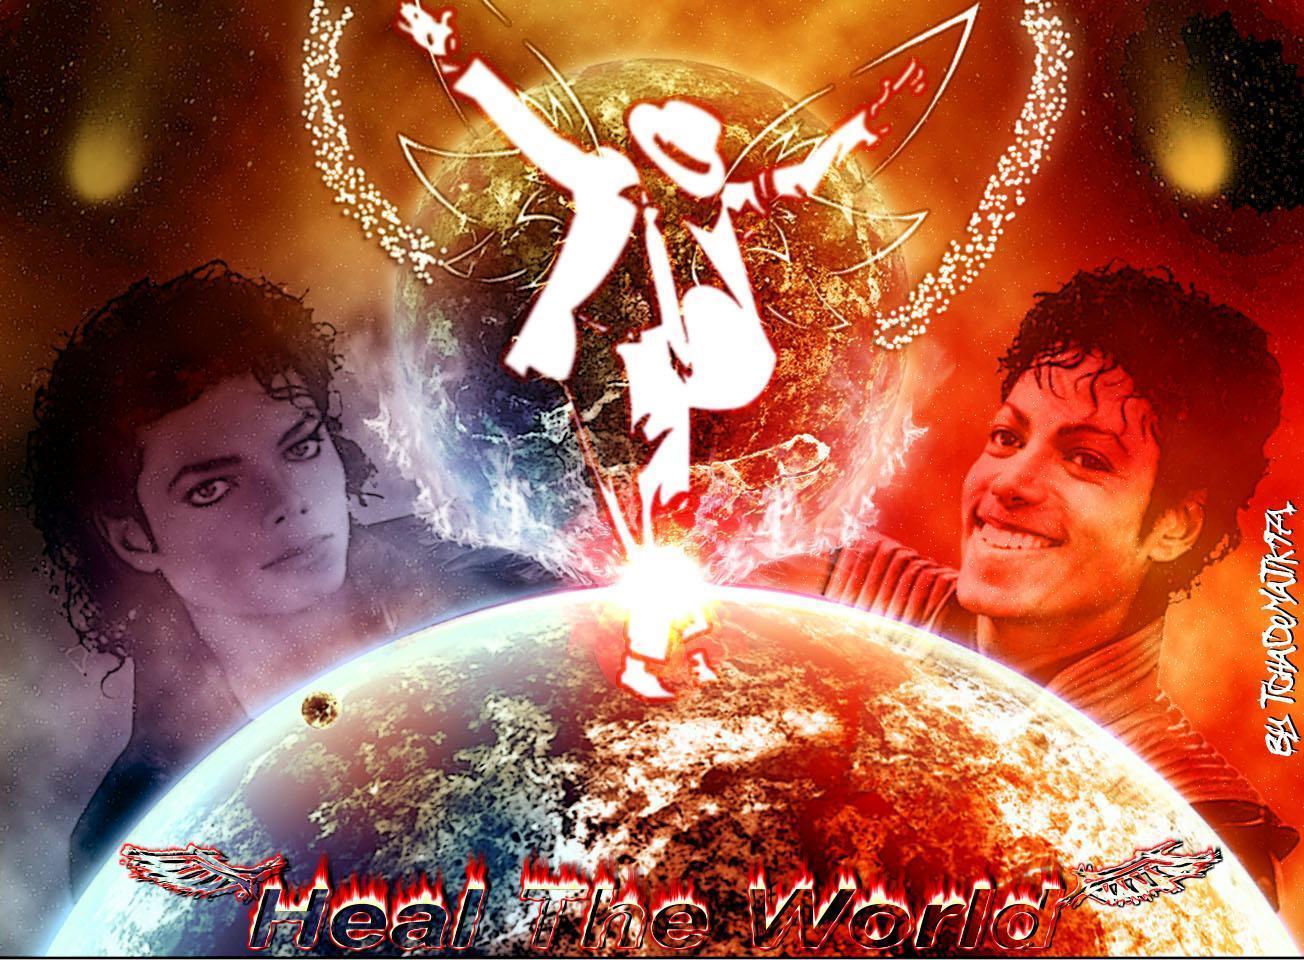 http://1.bp.blogspot.com/-zZpH9VFBkUM/Tk3wA7KmkOI/AAAAAAAAAyo/LgoUH-I7ZDw/s1600/Heal-The-World-michael-jackson-7984220-1304-960.jpg